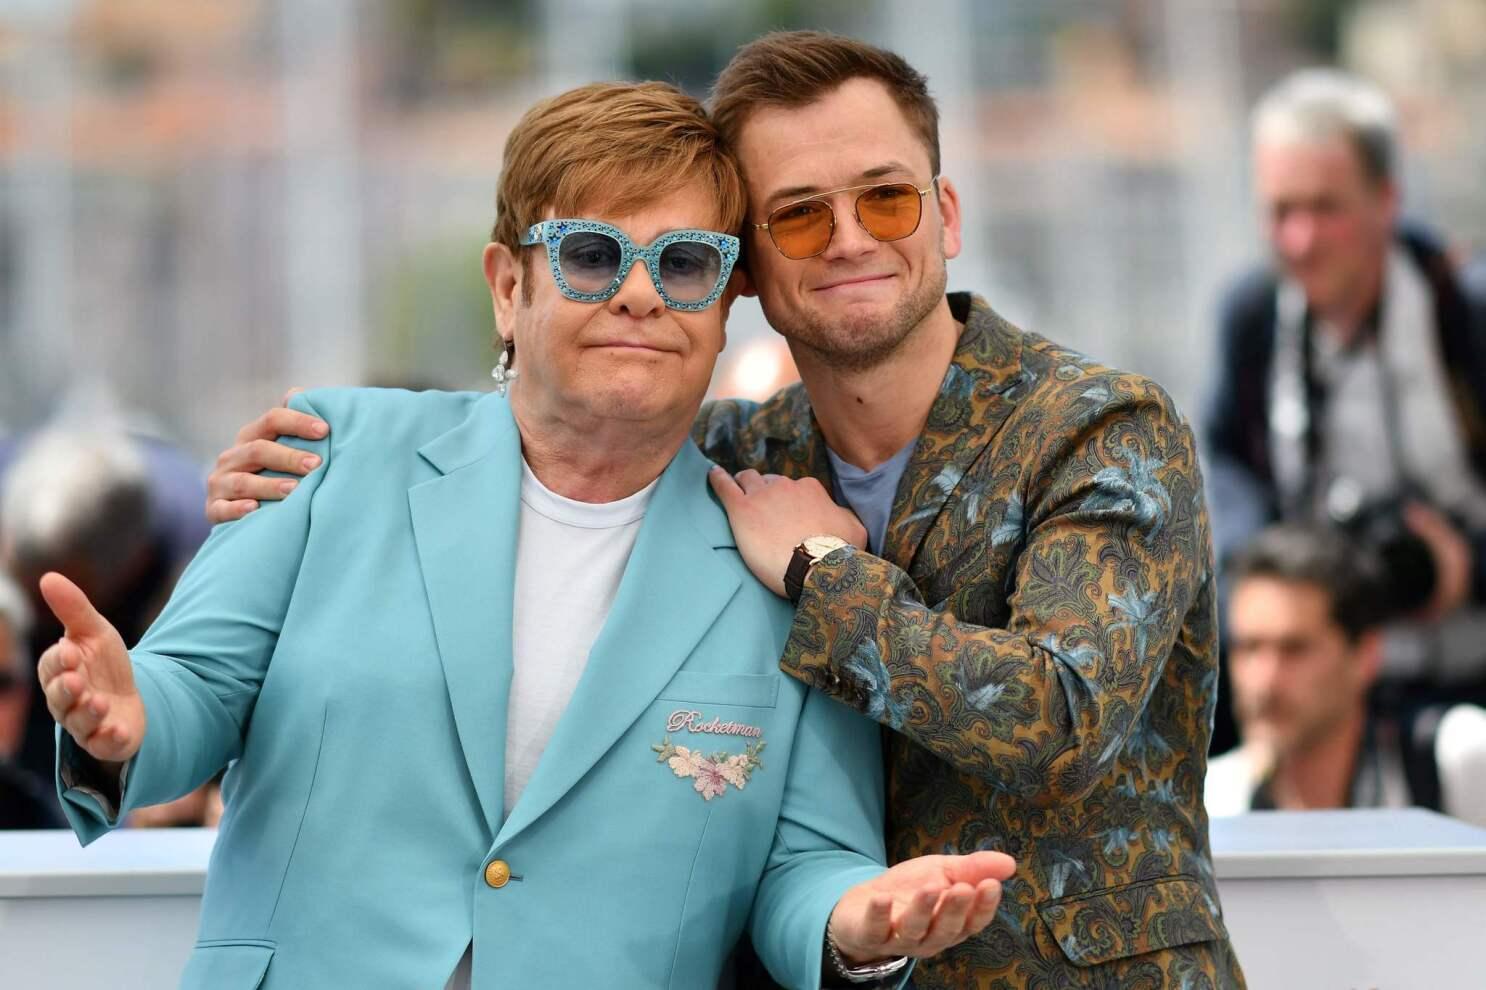 Rocketman' star Taron Egerton on becoming Elton John - Los Angeles Times